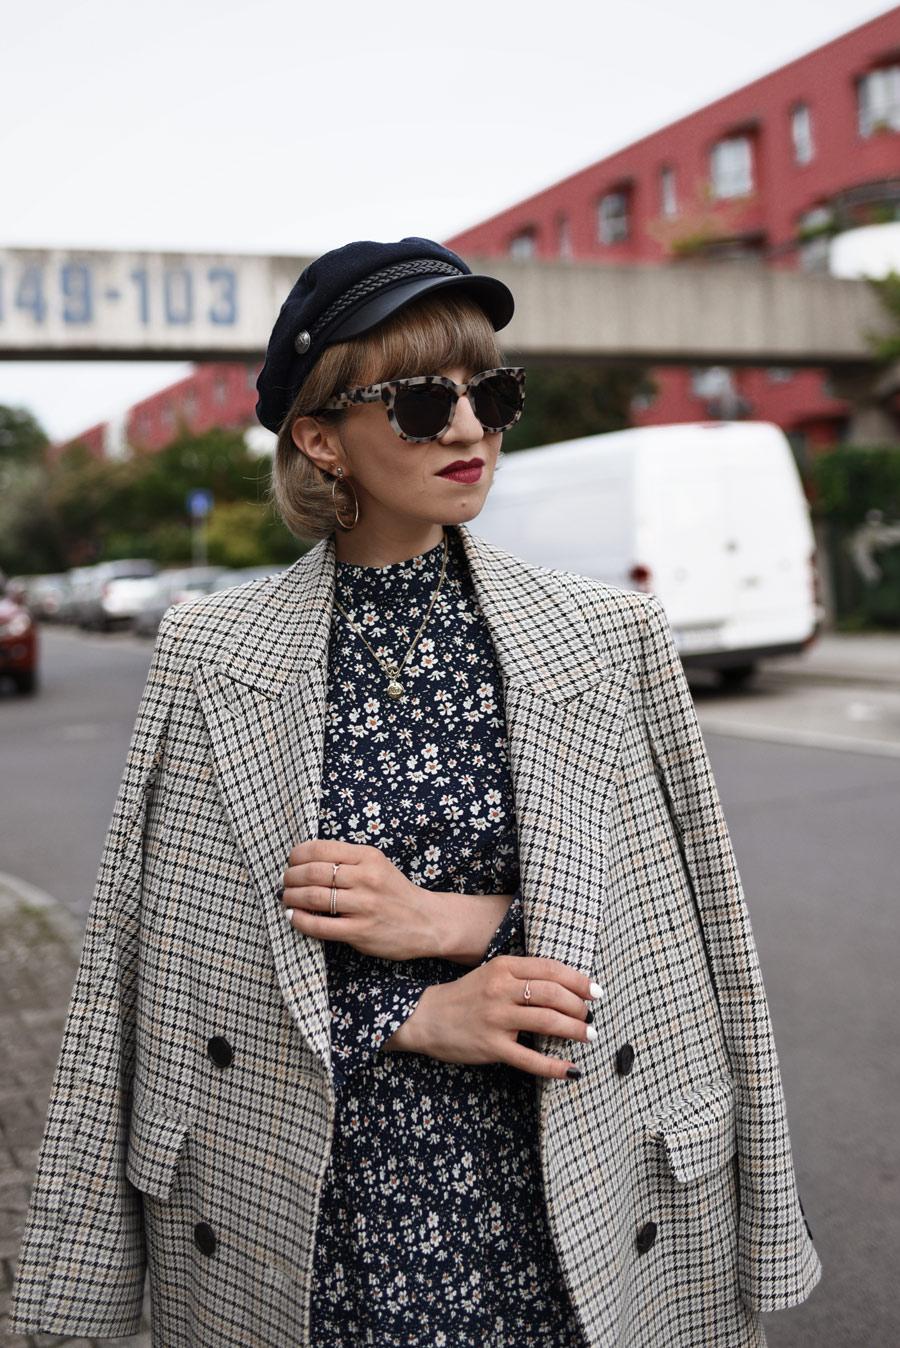 oversized, coat, mantel, h&m, kleid, bluemchen, blogger, fashionblog, modeblog, muenchen, outfit